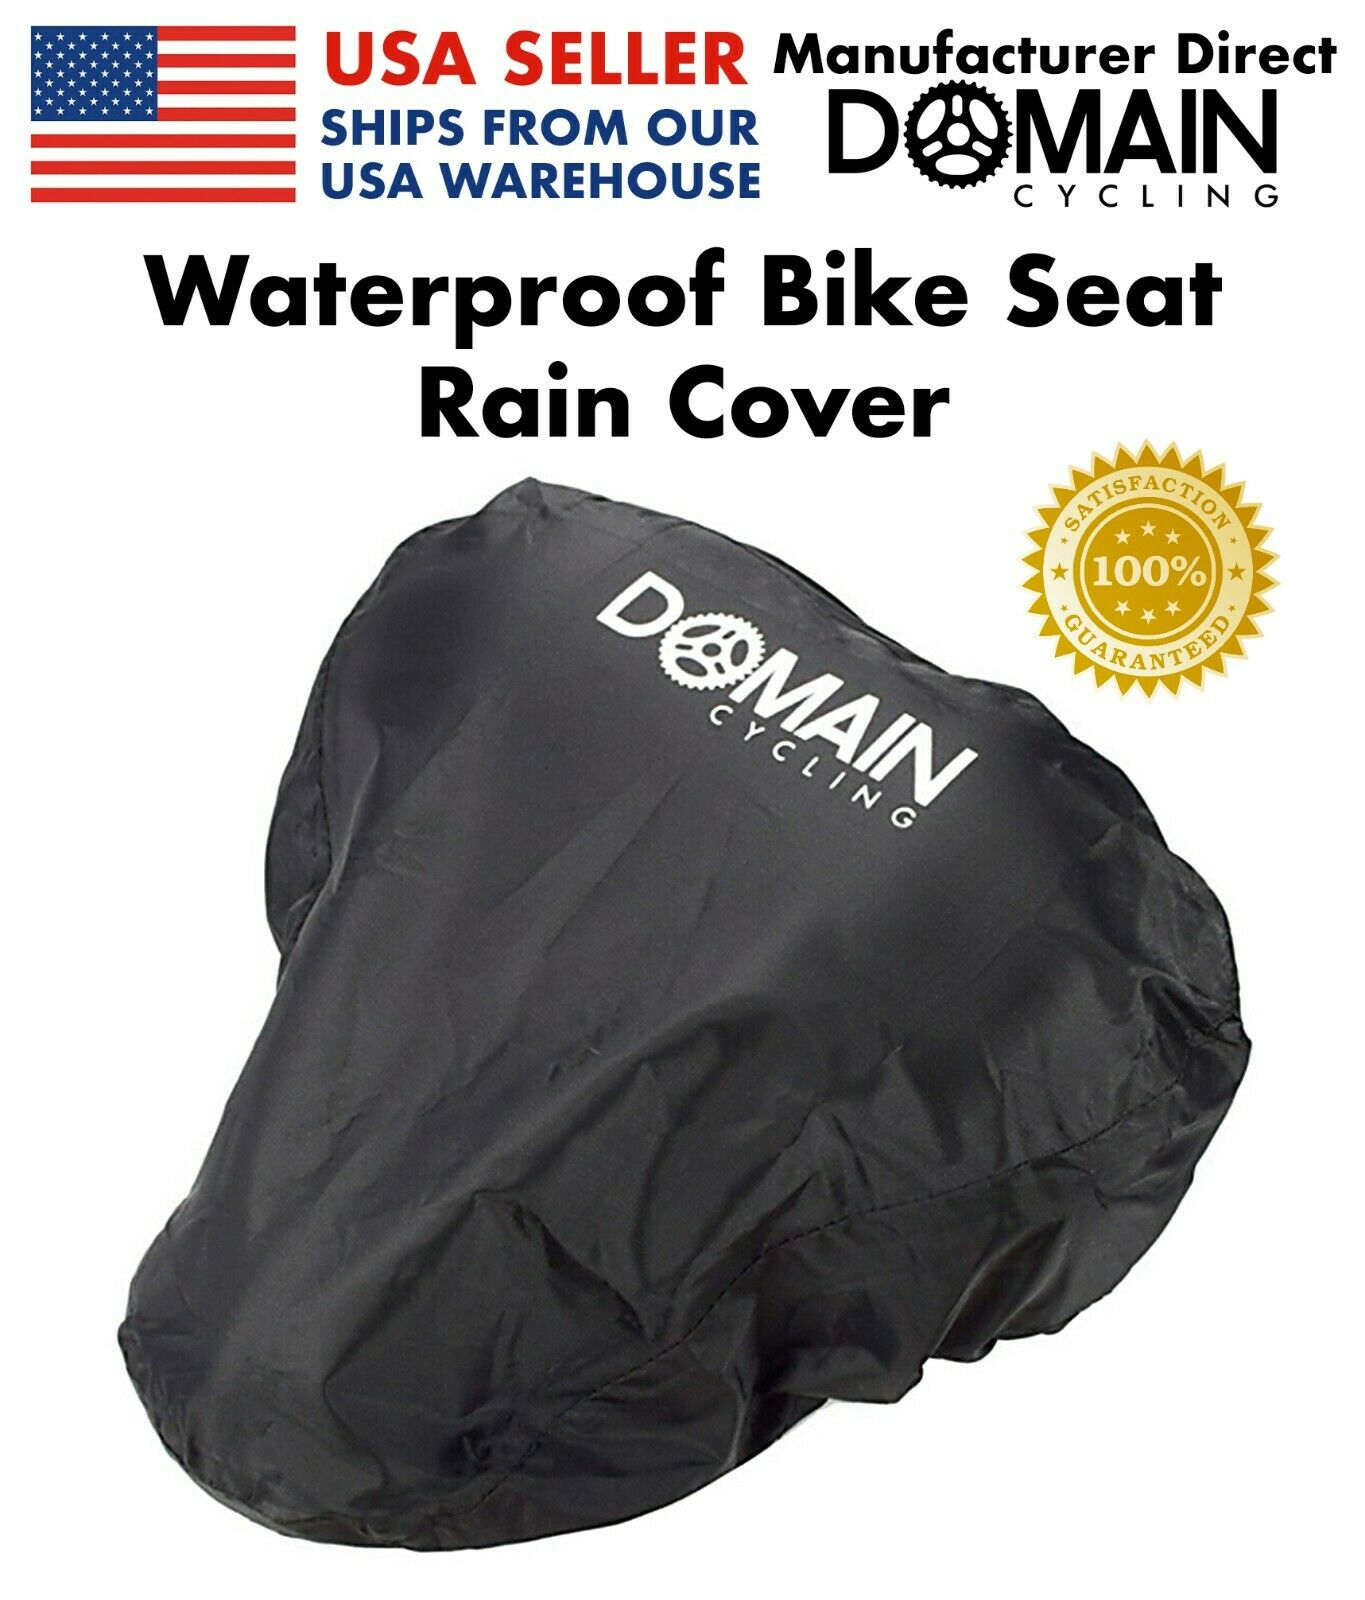 waterproof bike seat rain cover, protective water resistant